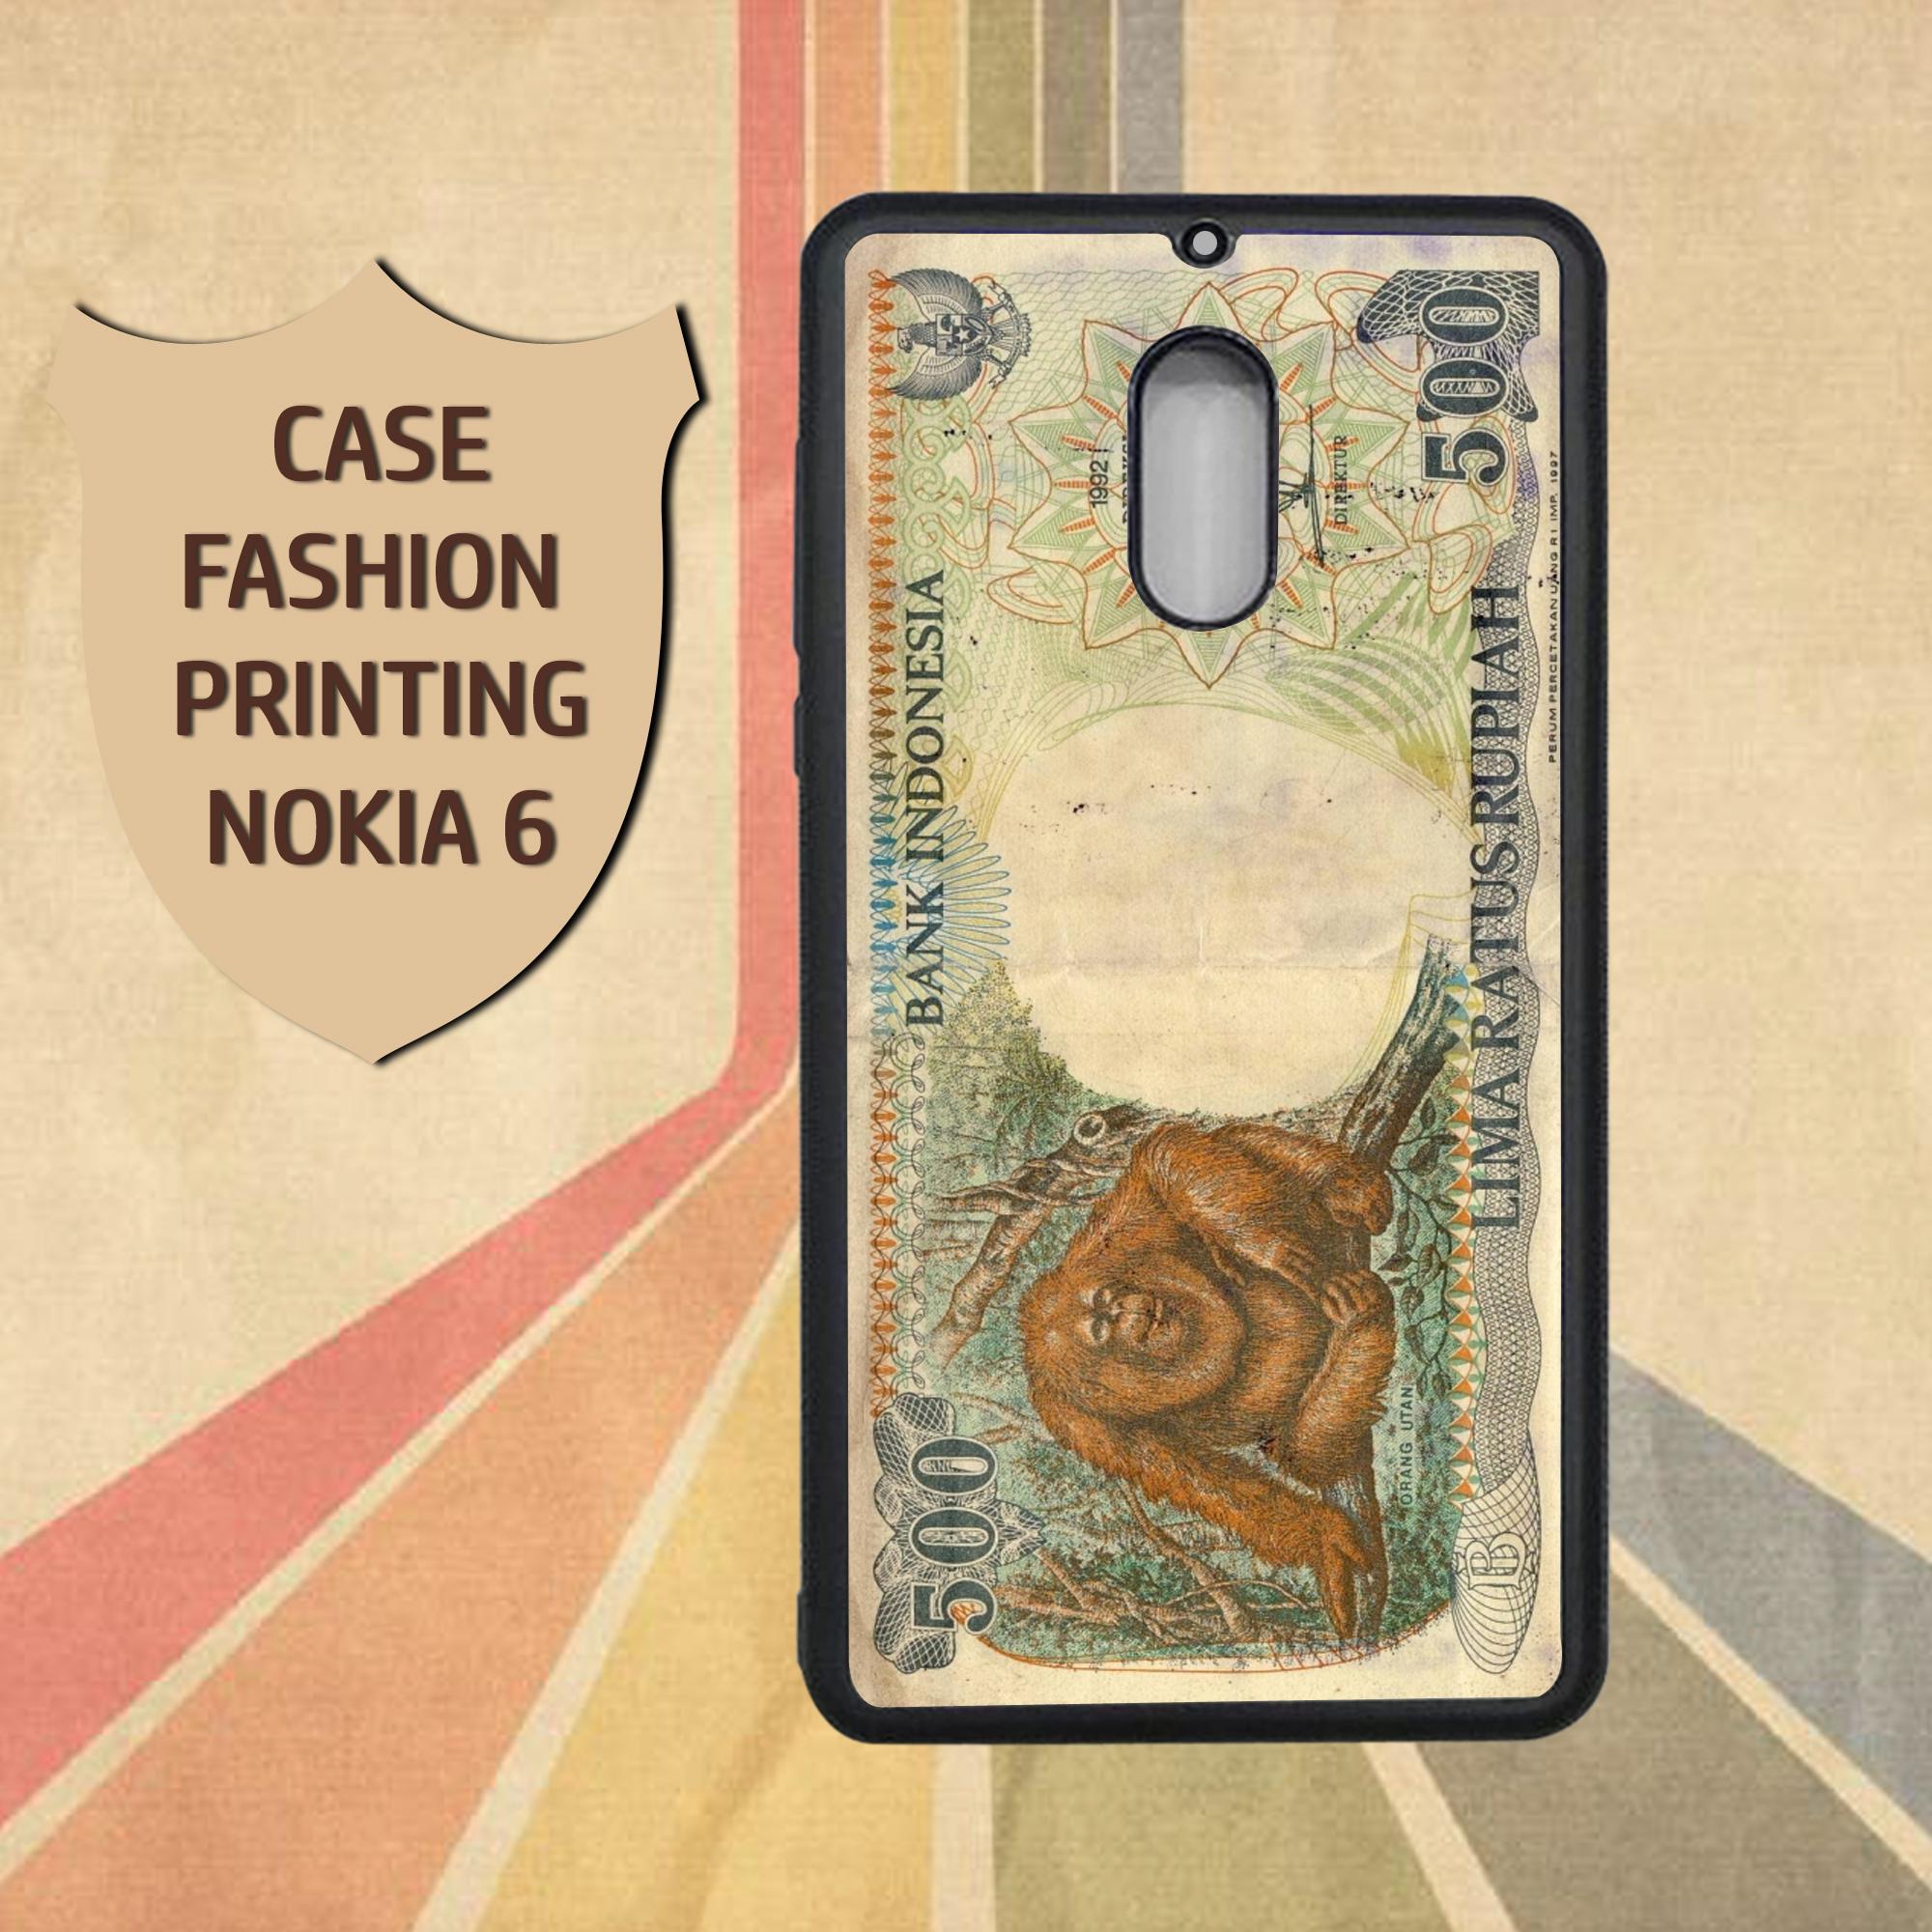 Rajamurah fasion printing case Nokia6 - 5